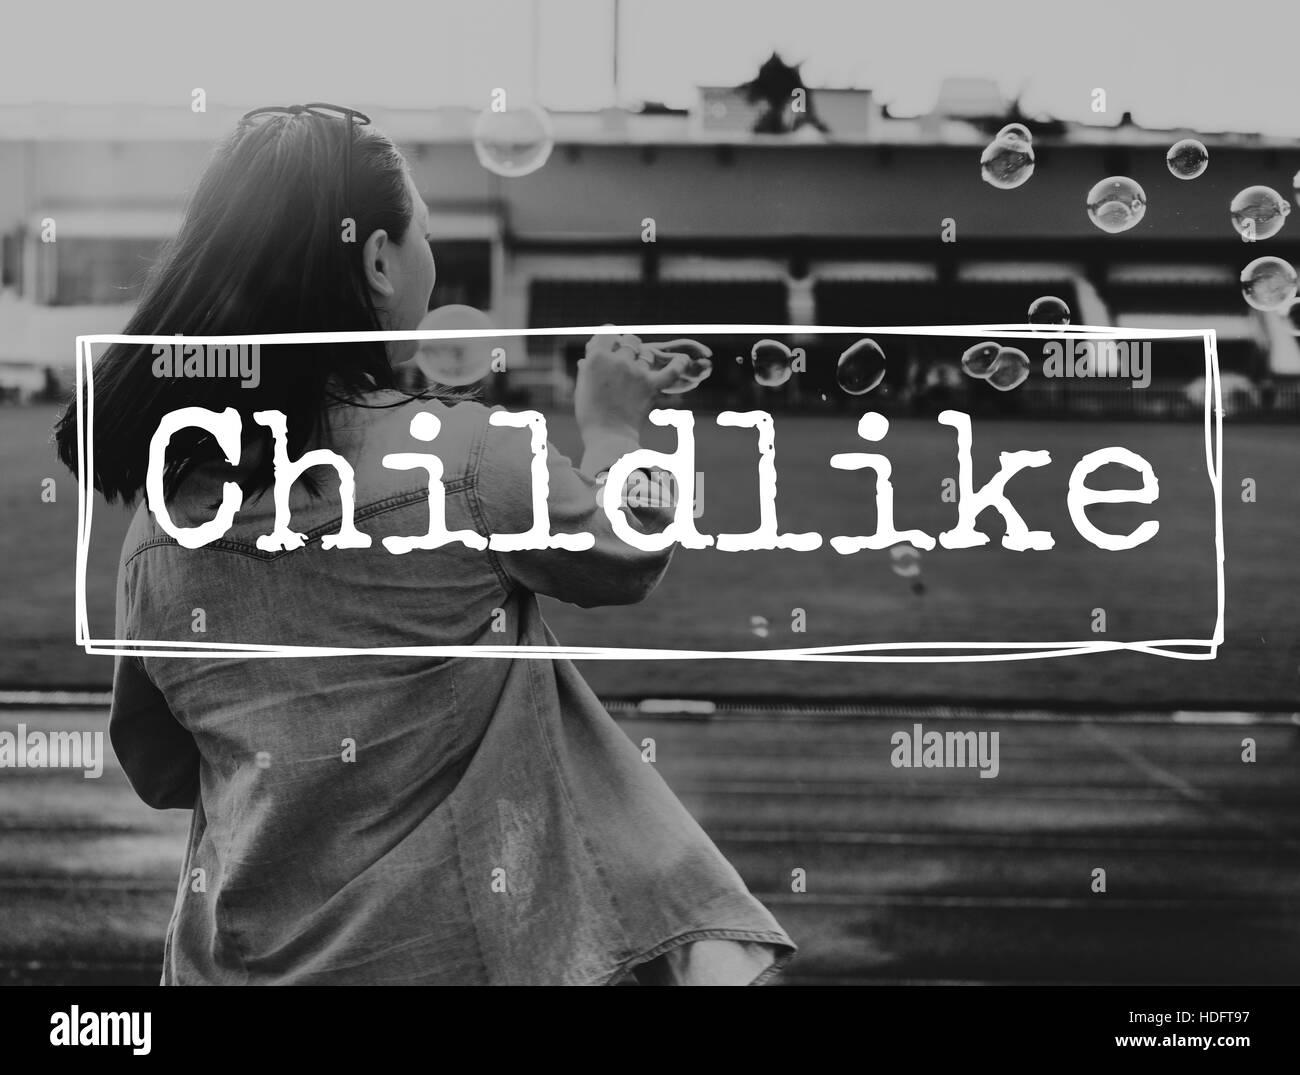 Childhood Childlike Child Children Kids Offspring Concept - Stock Image